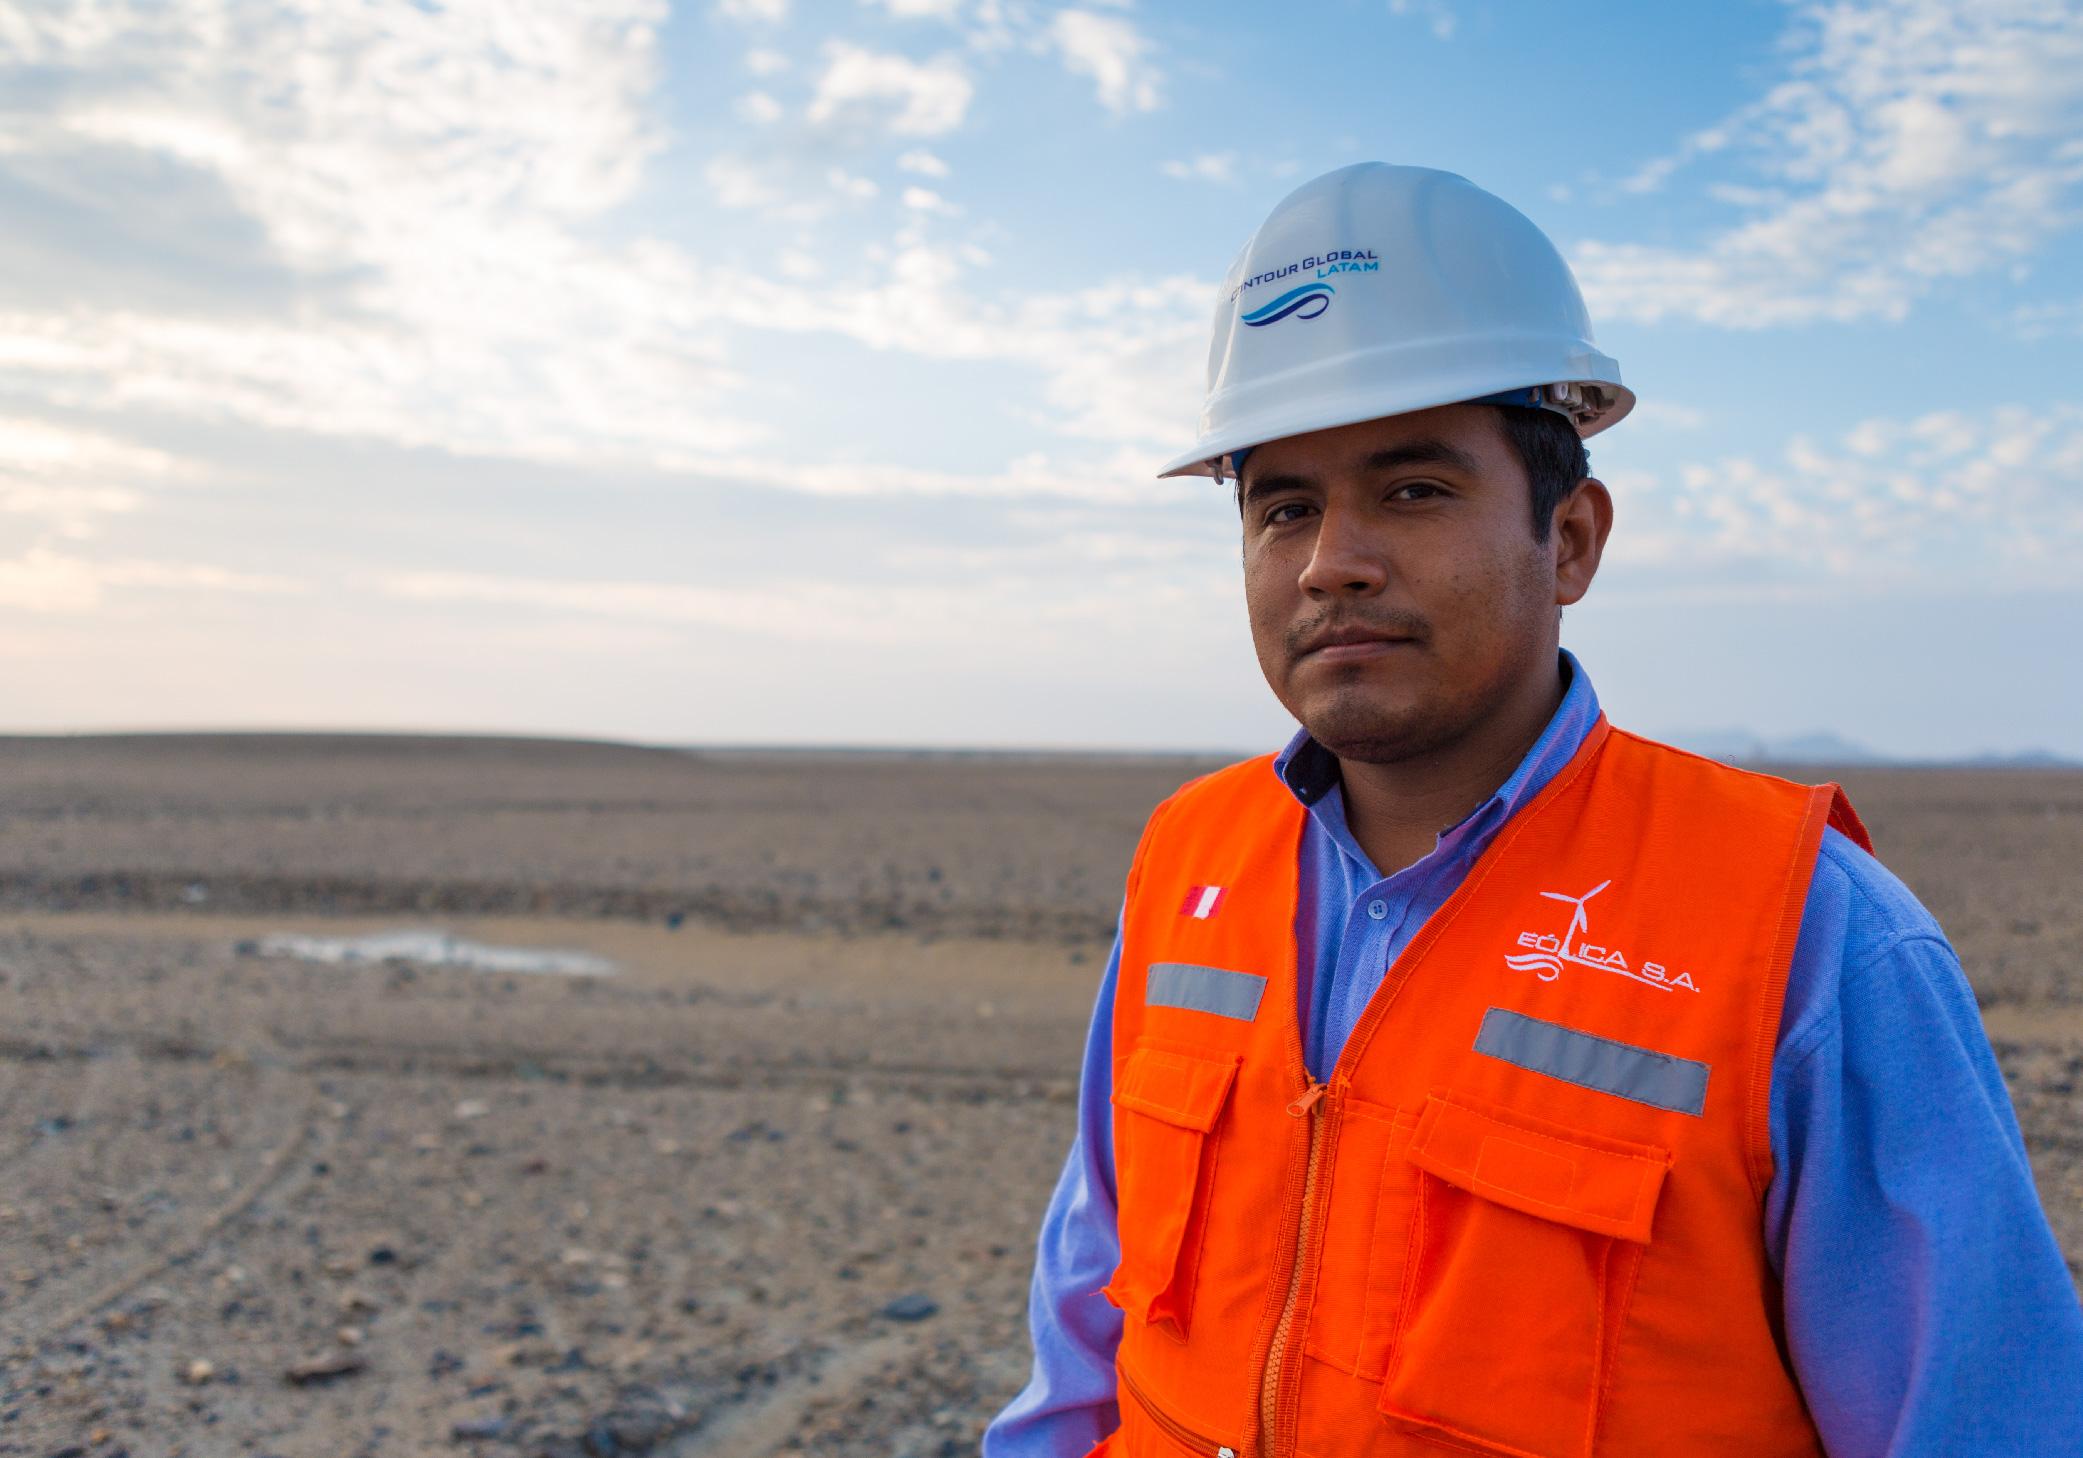 ContourGlobal employee, Pacasmayo, Peru